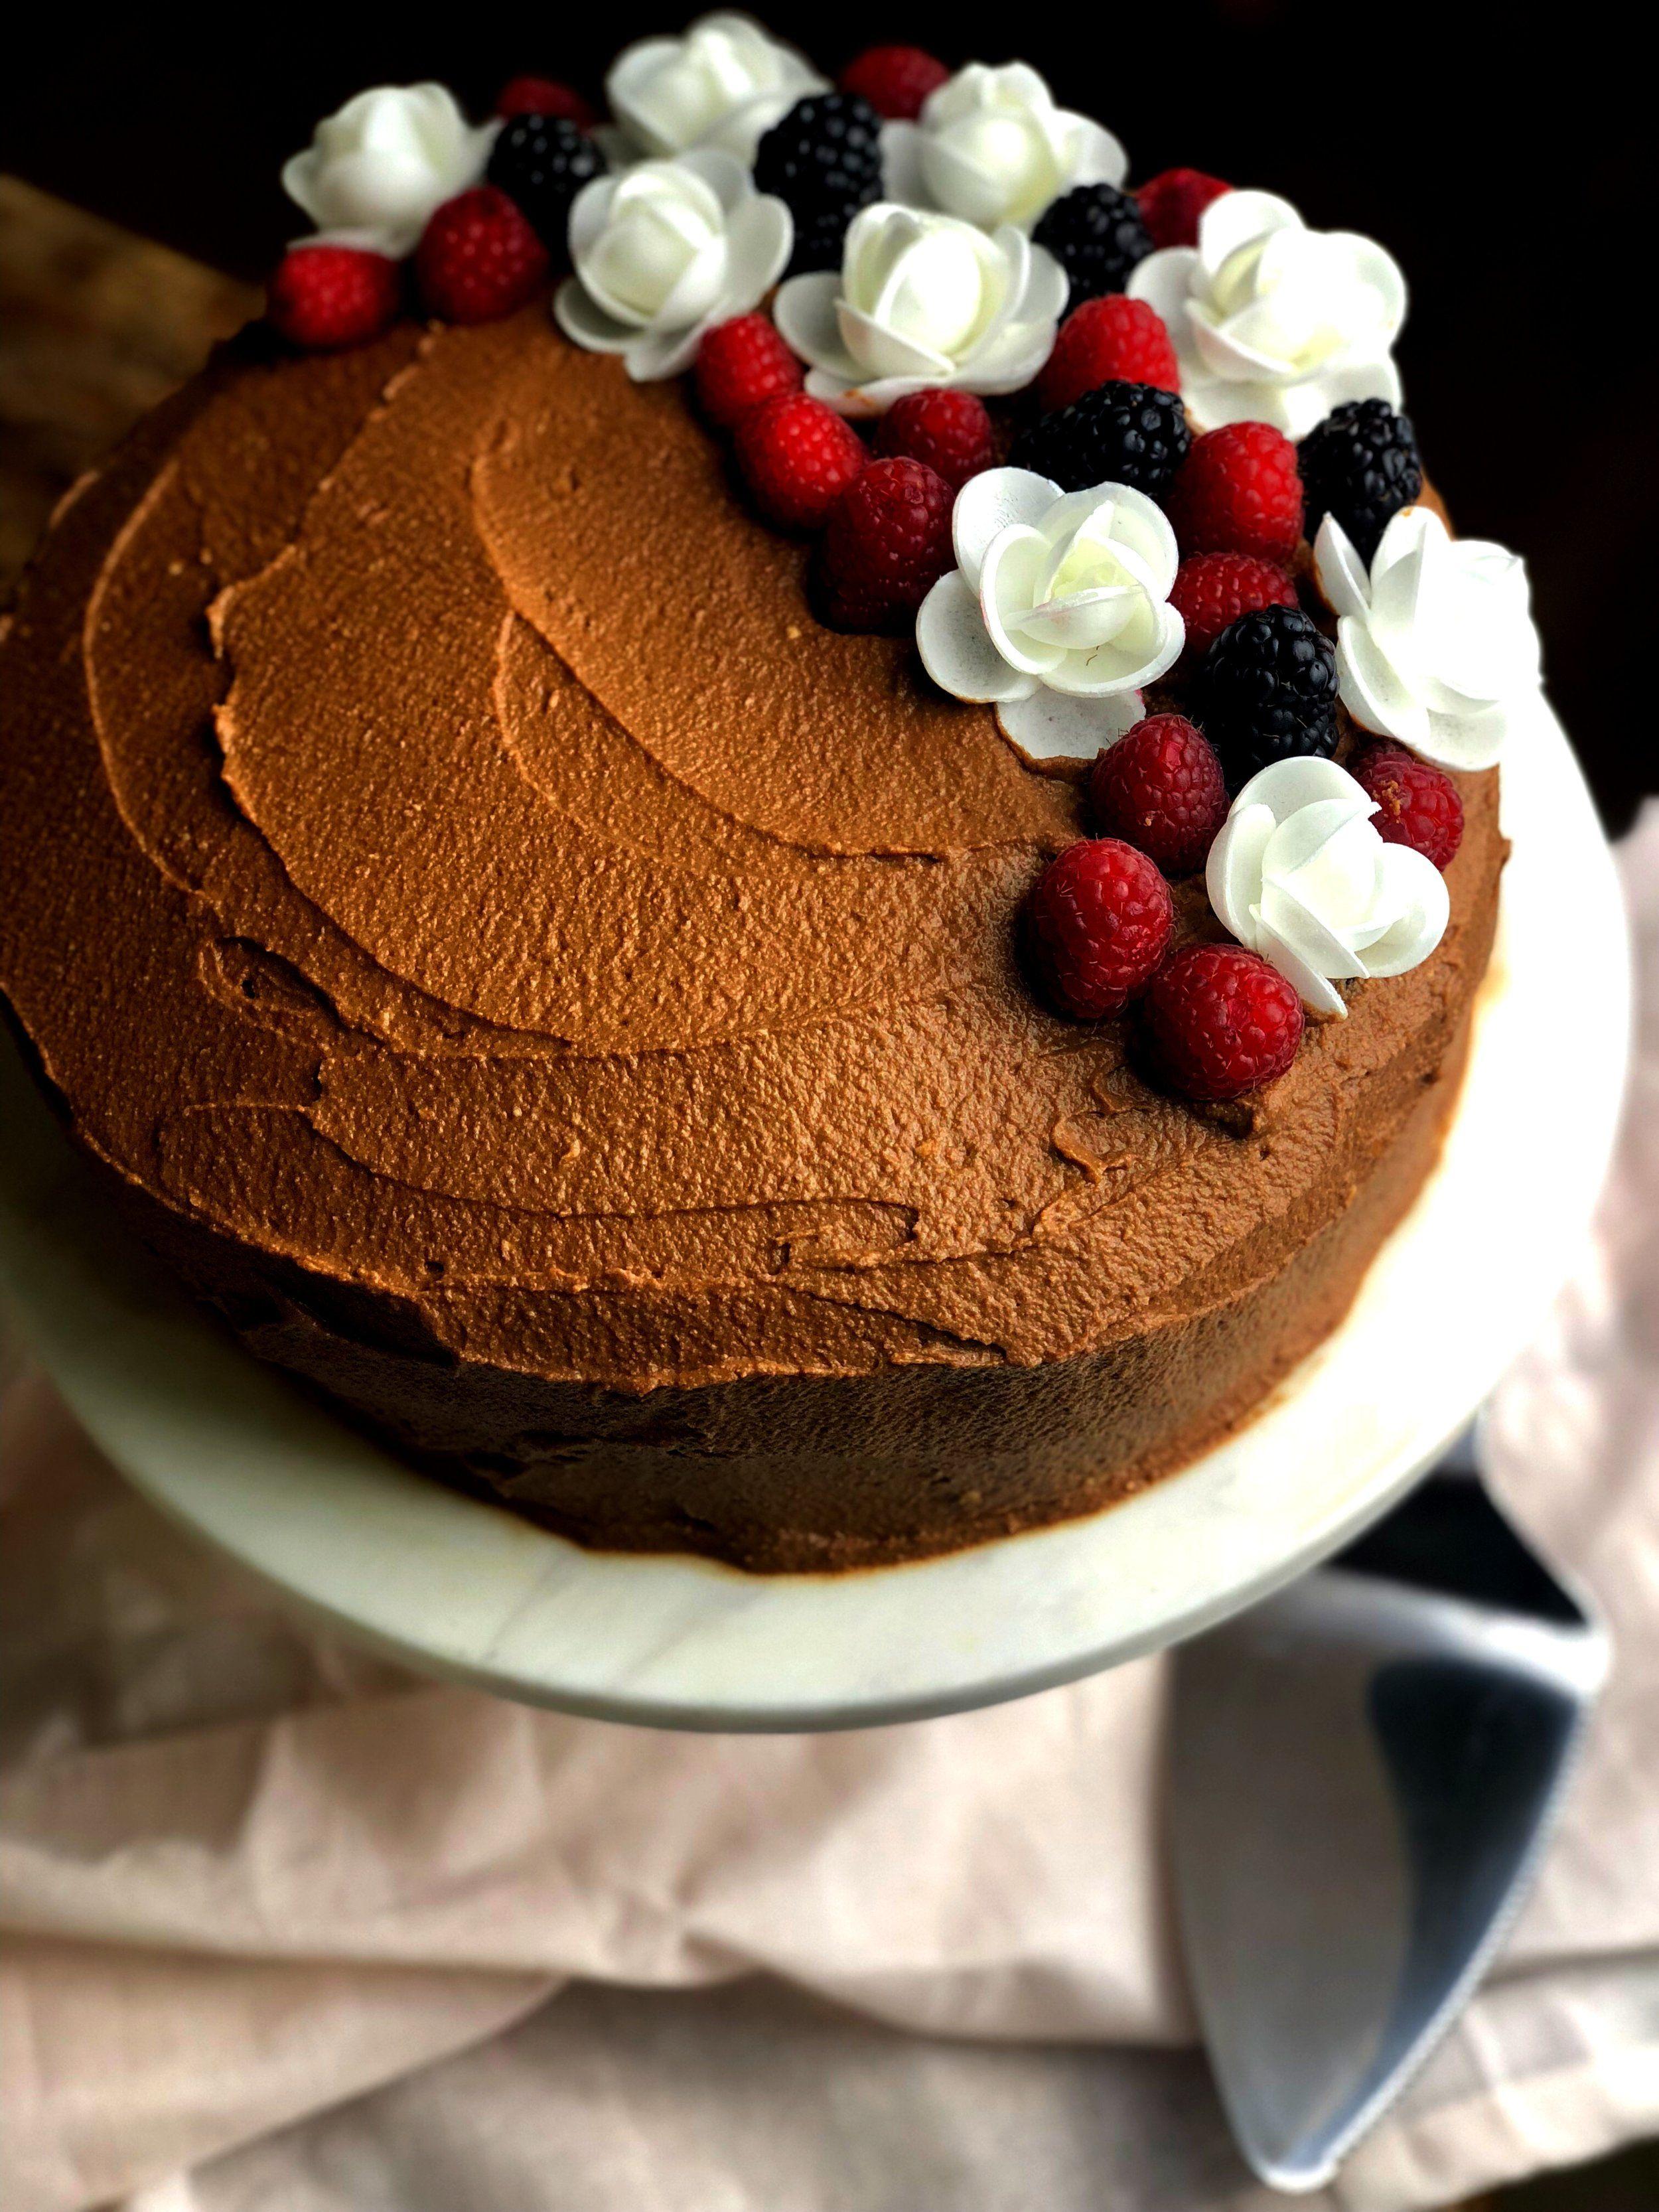 Chocolate birthday cake keto lowcarb gluten free with